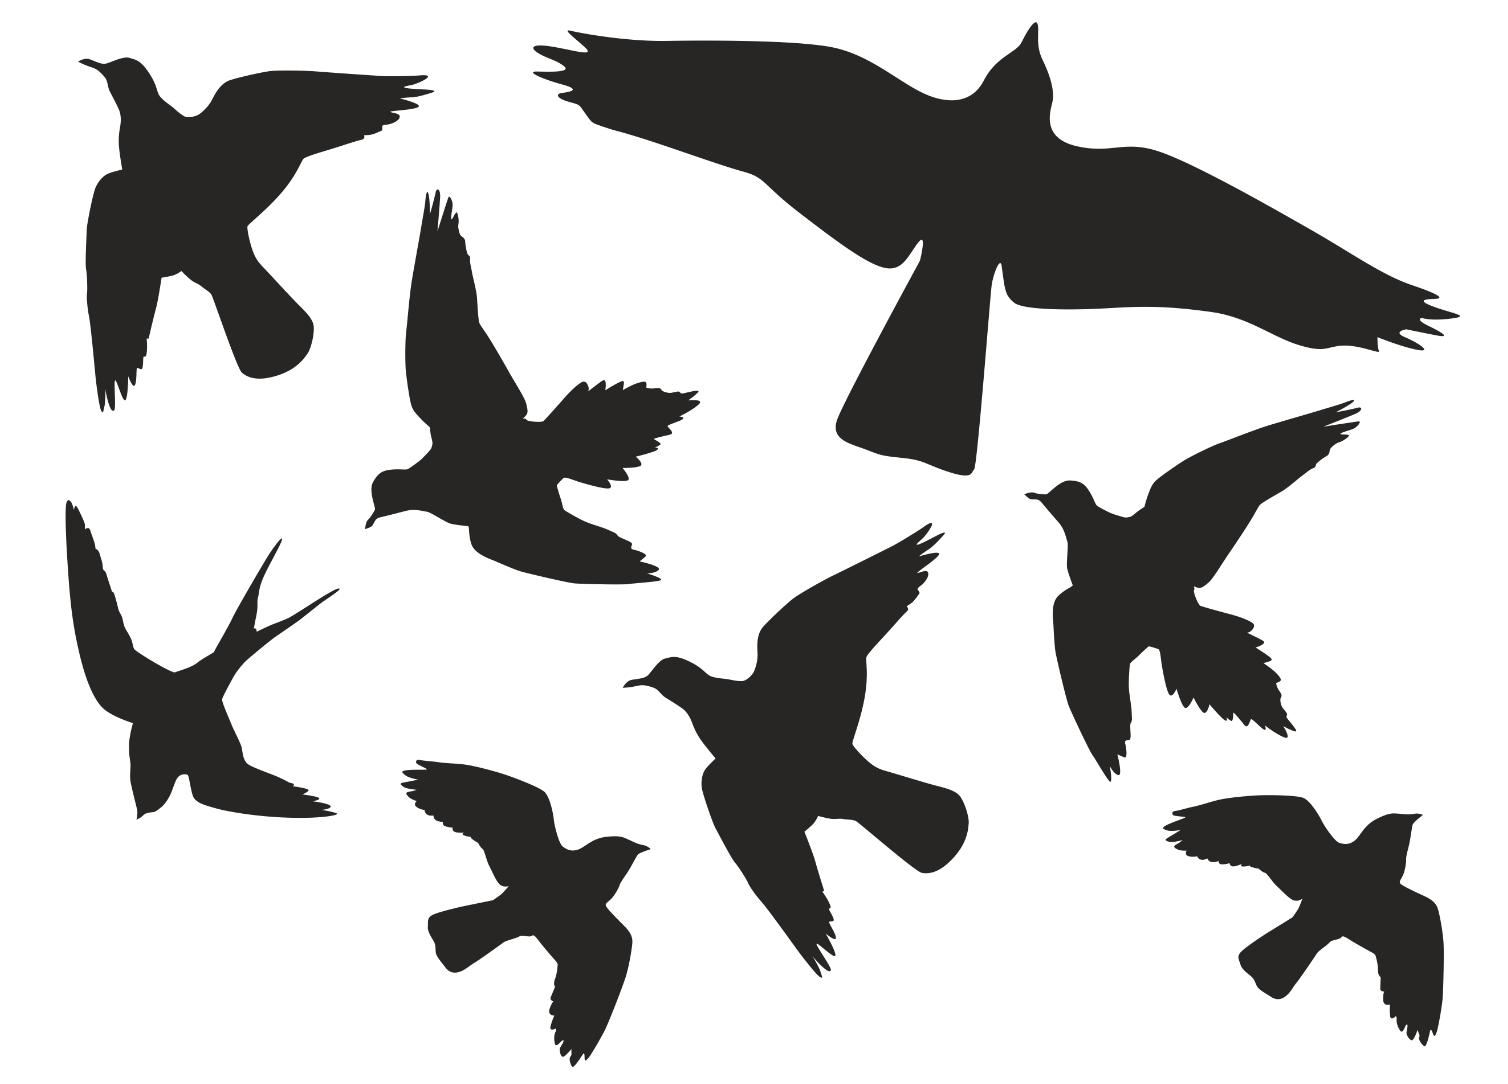 8 Stück Vögel Aufkleber Vogel Vogelschutz Warnvögel Wintergarten Fenster An 2